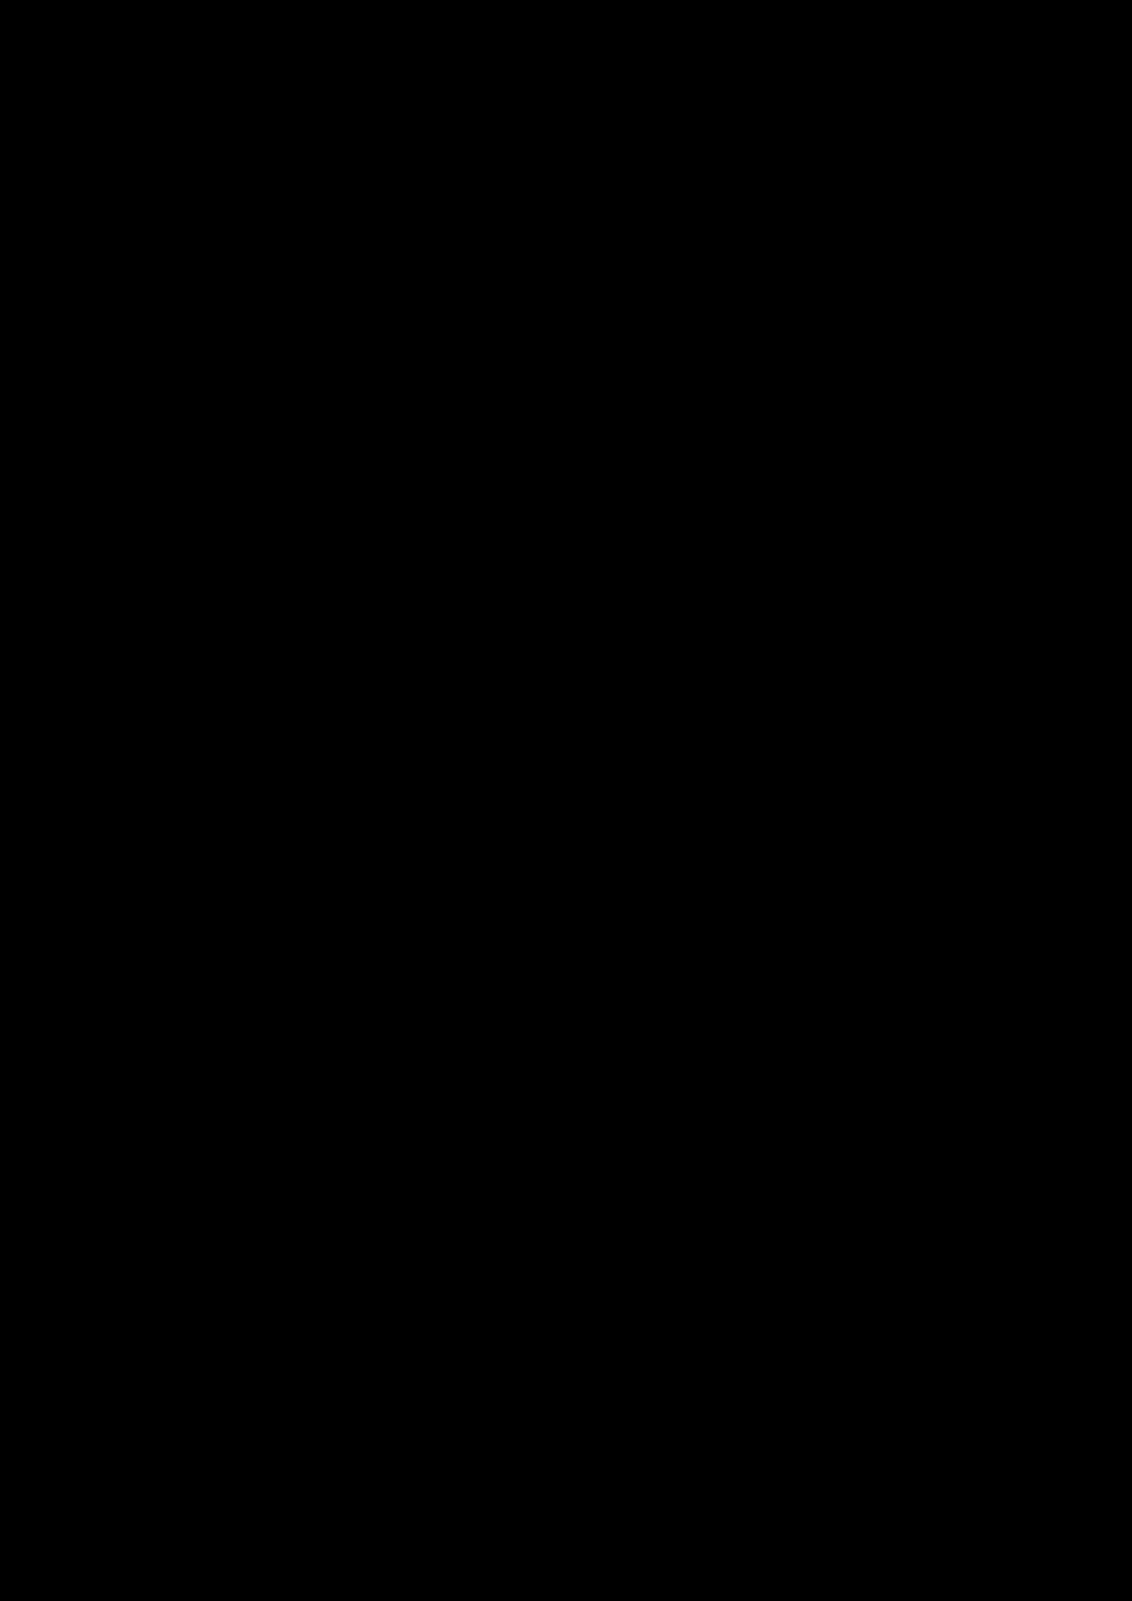 Belyiy sokol slide, Image 105